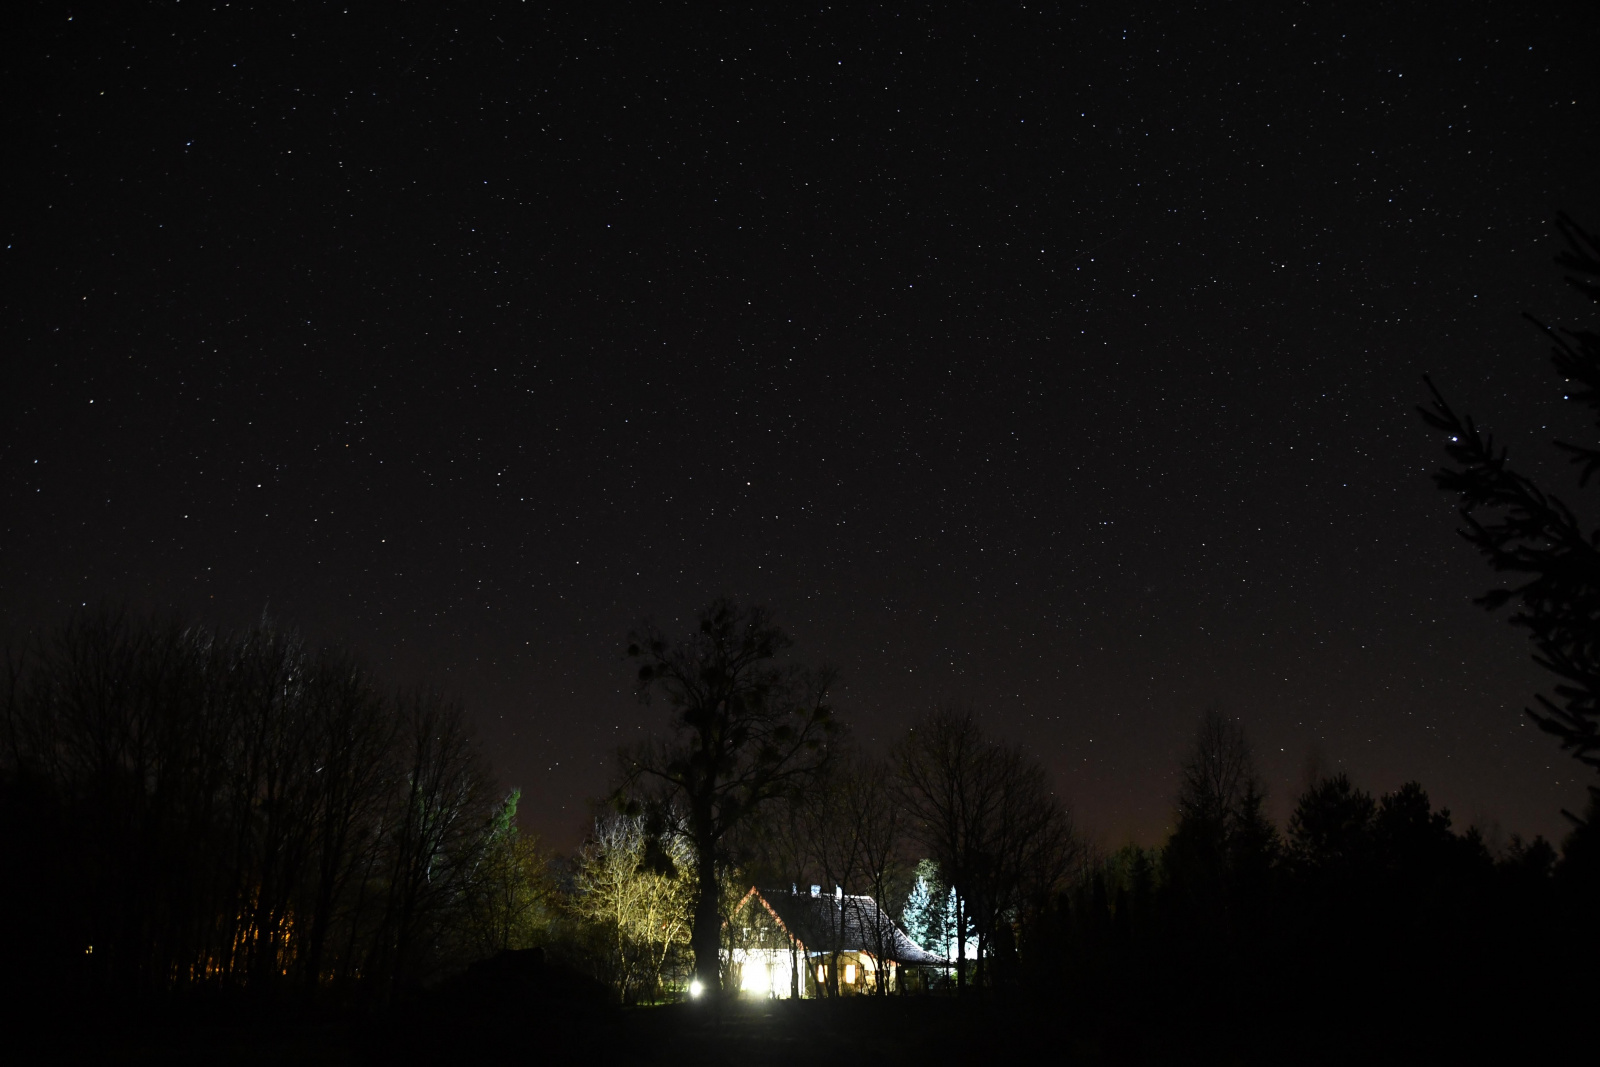 night house1.jpg